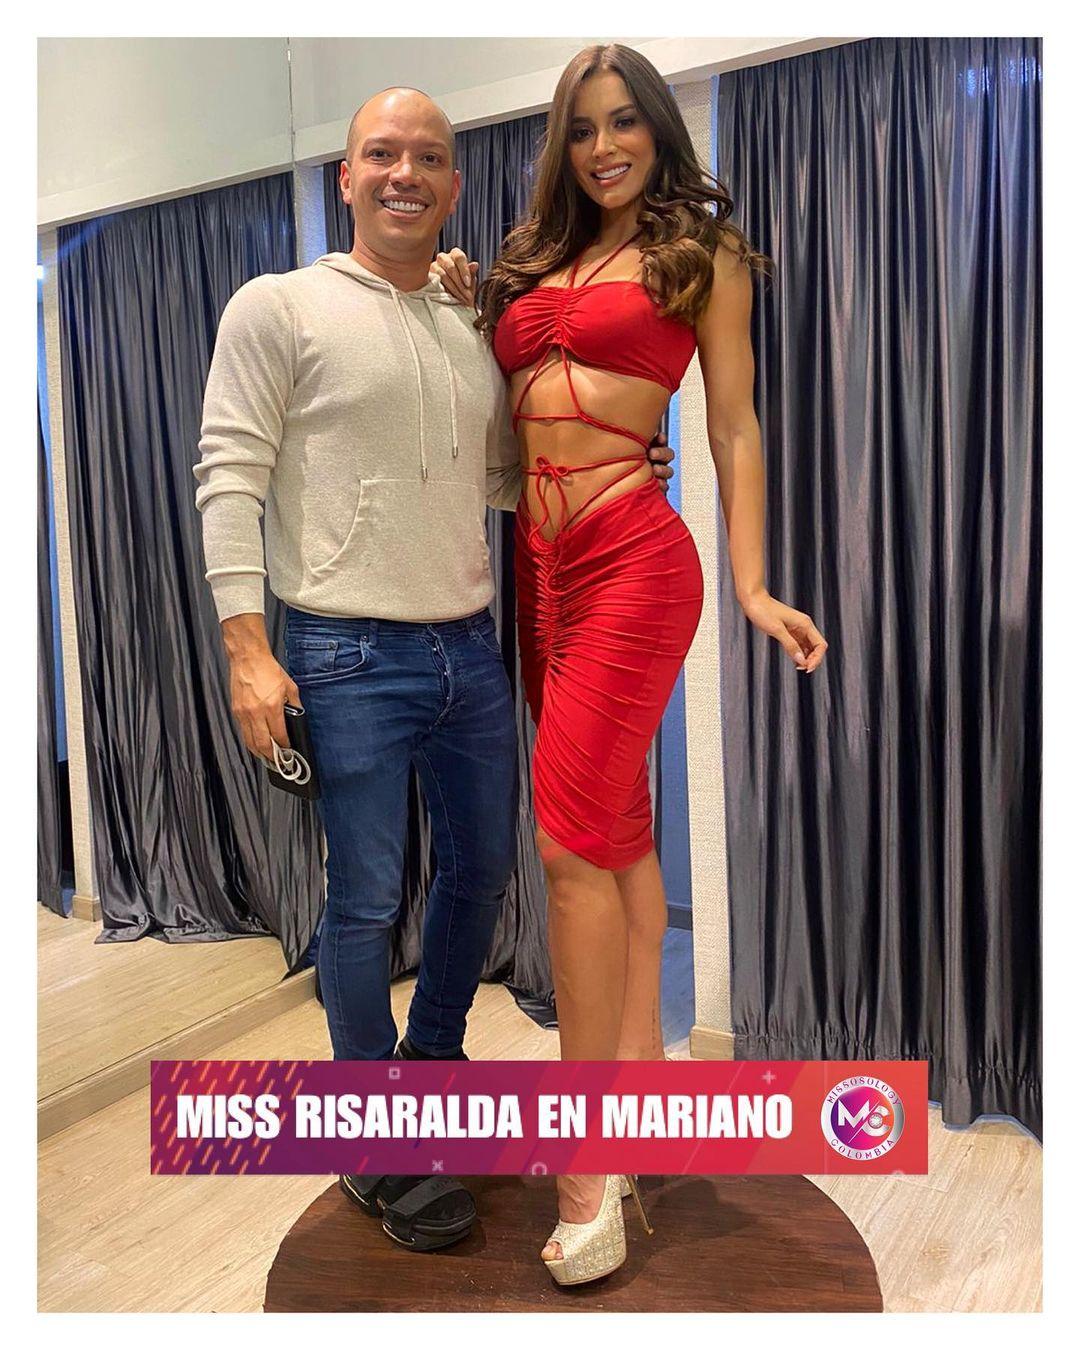 maria alejandra lopez perez, top 2 de miss universe colombia 2021/reyna hispanoamericana 2013/miss caraibes hibiscus 2014/miss colombia mundo 2015. - Página 3 24057816